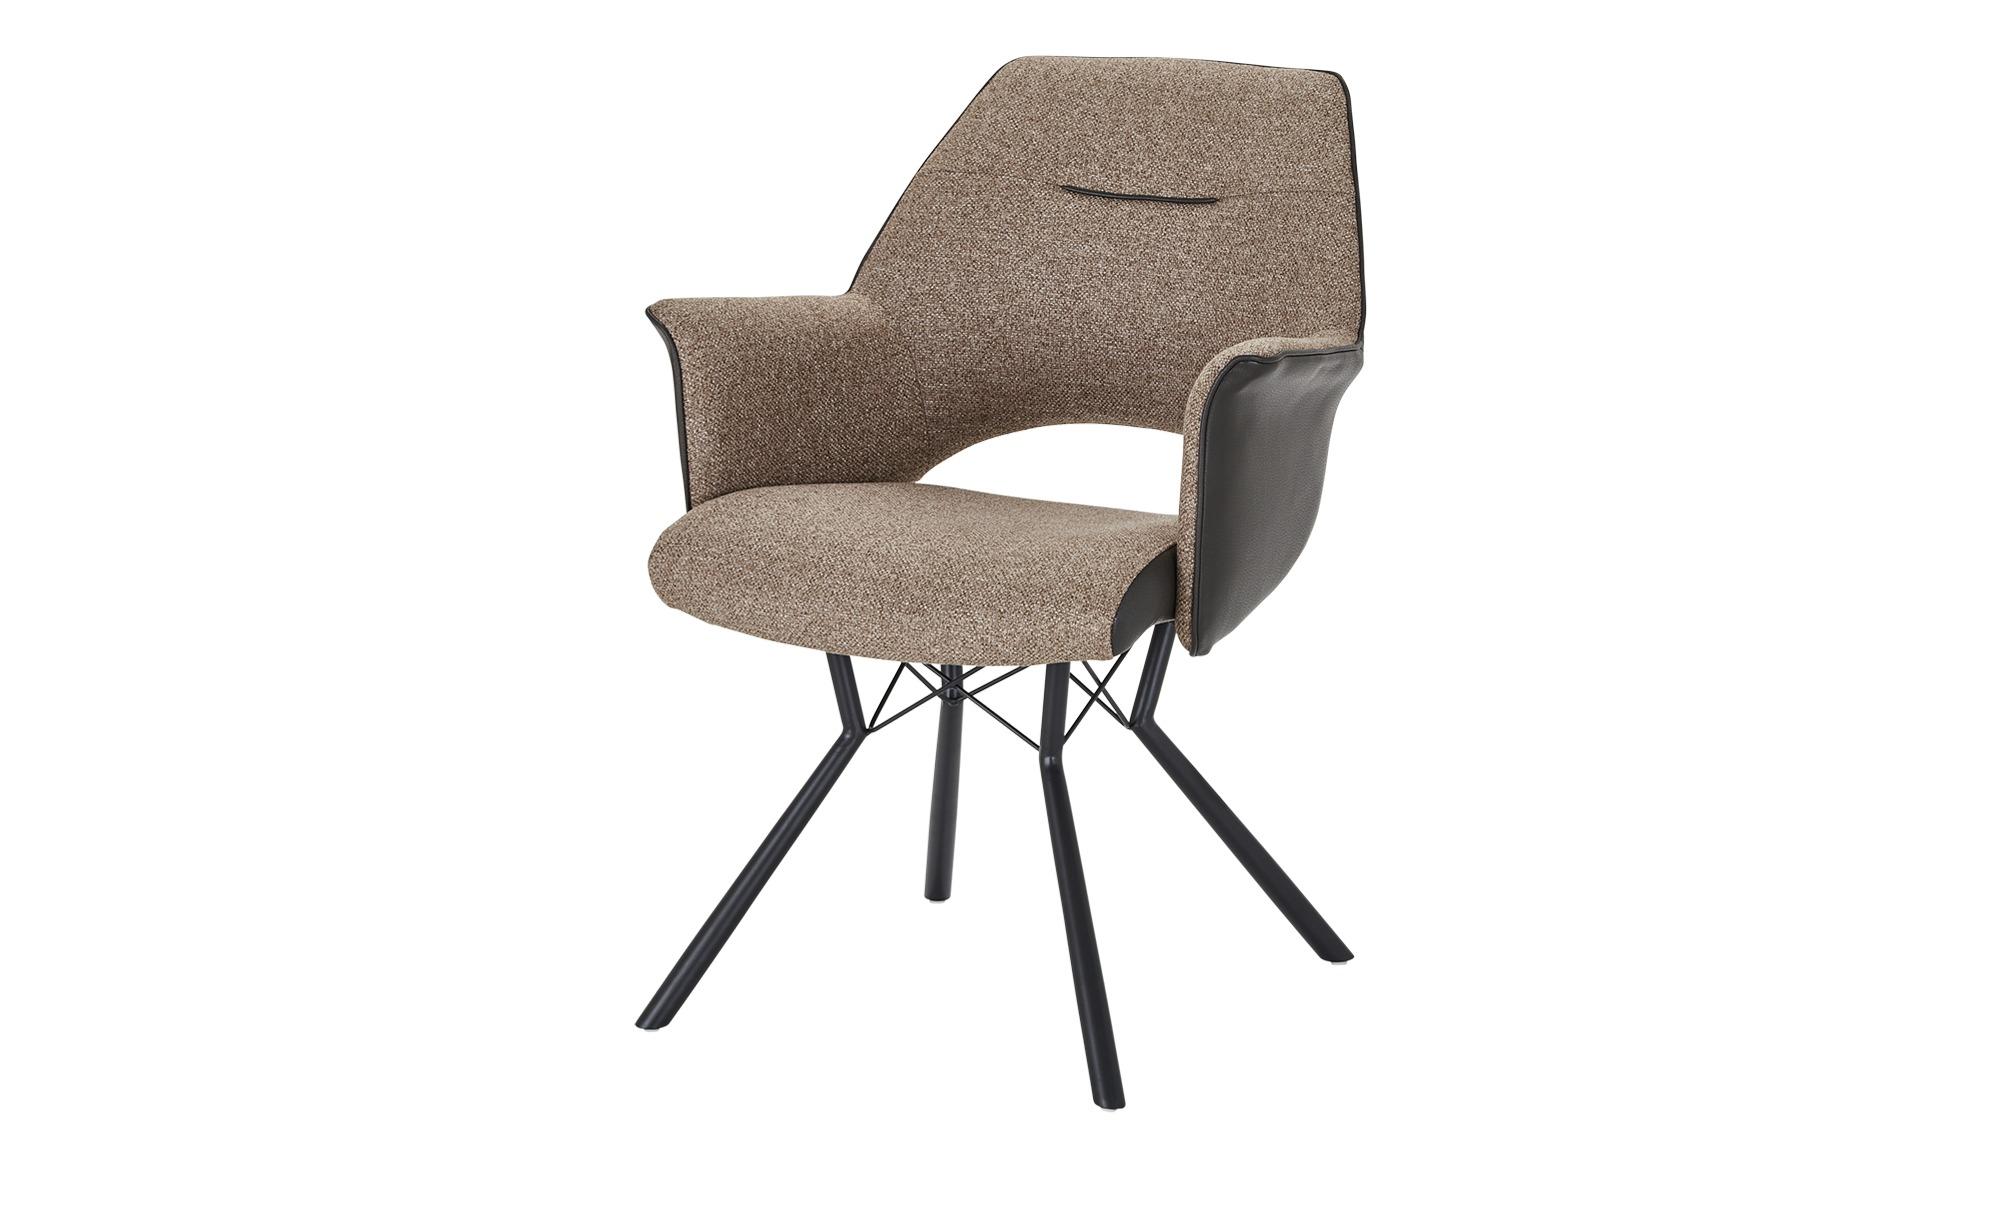 uno Sessel  Vineo ¦ braun ¦ Maße (cm): B: 63 H: 86,5 T: 66 Stühle > Esszimmerstühle > Esszimmerstühle mit Armlehnen - Höffner